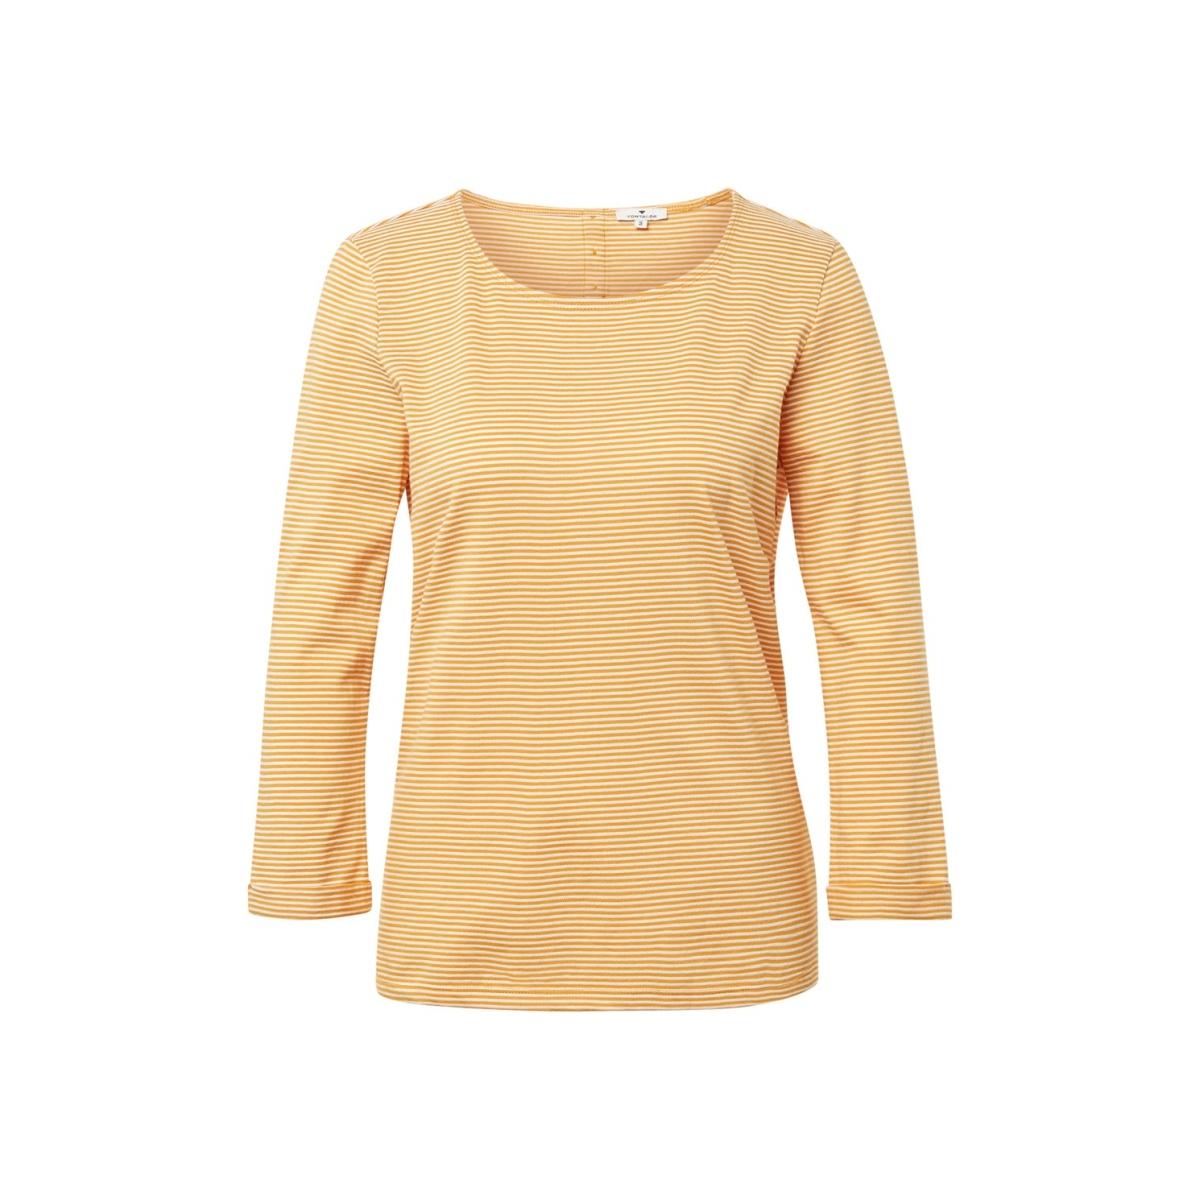 shirt gemaakt van gestreepte pique 1013915 xx 70 tom tailor t-shirt 19993